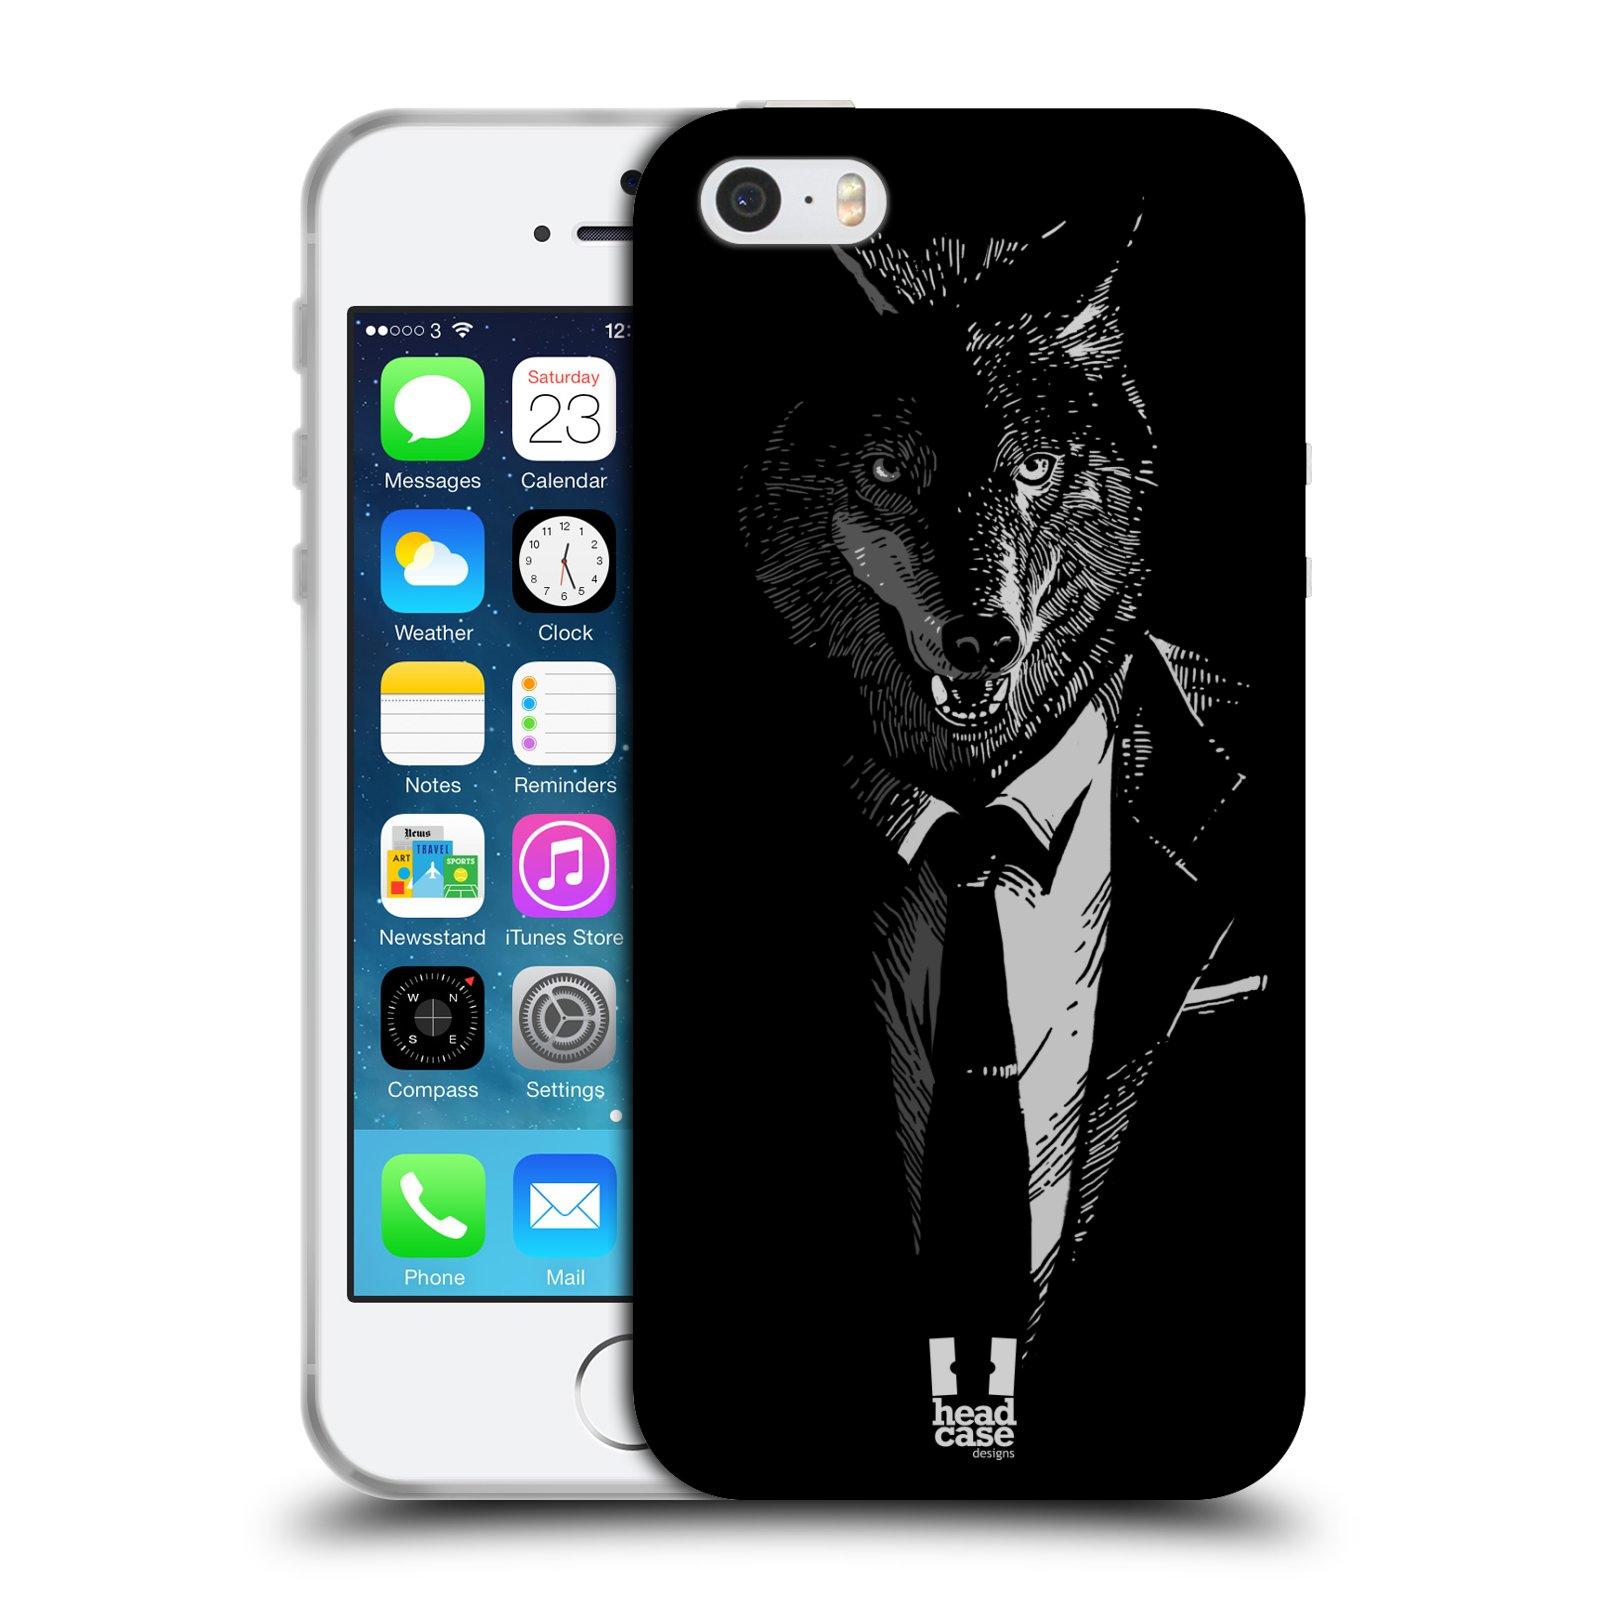 HEAD CASE silikonový obal na mobil Apple Iphone 5 5S vzor Zvíře v obleku  vlk empty 796b44fad76